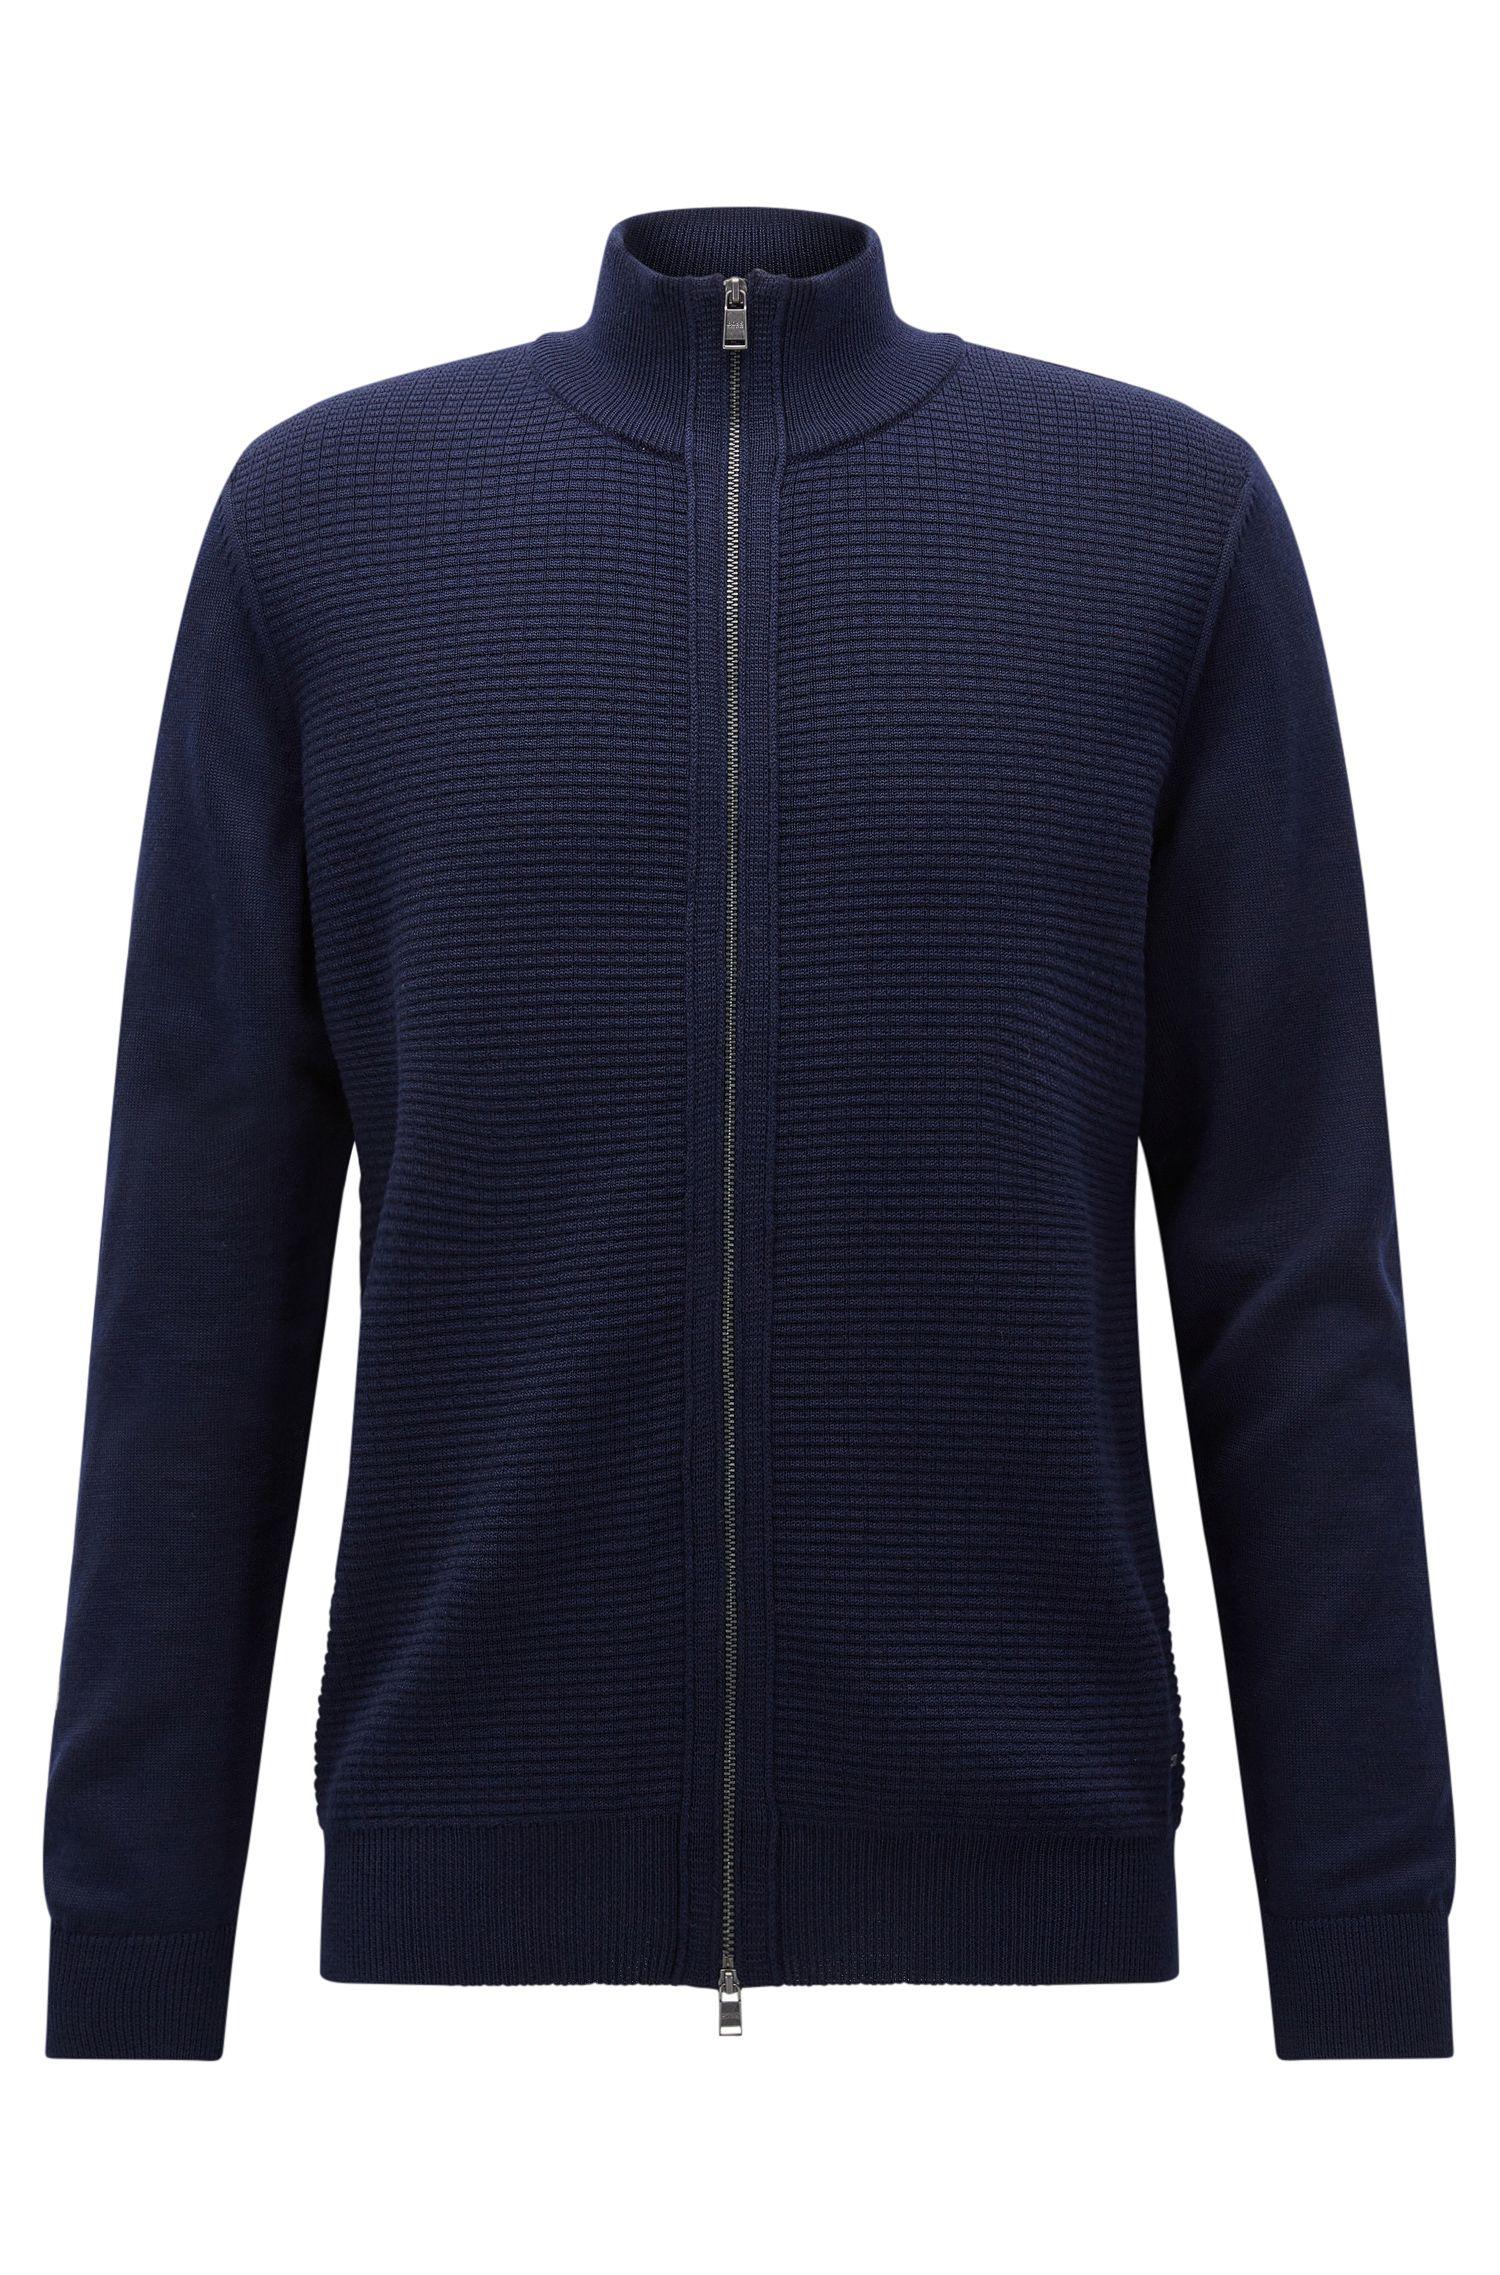 Waffle Knit Virgin Wool Zip Jacket | Naddeo